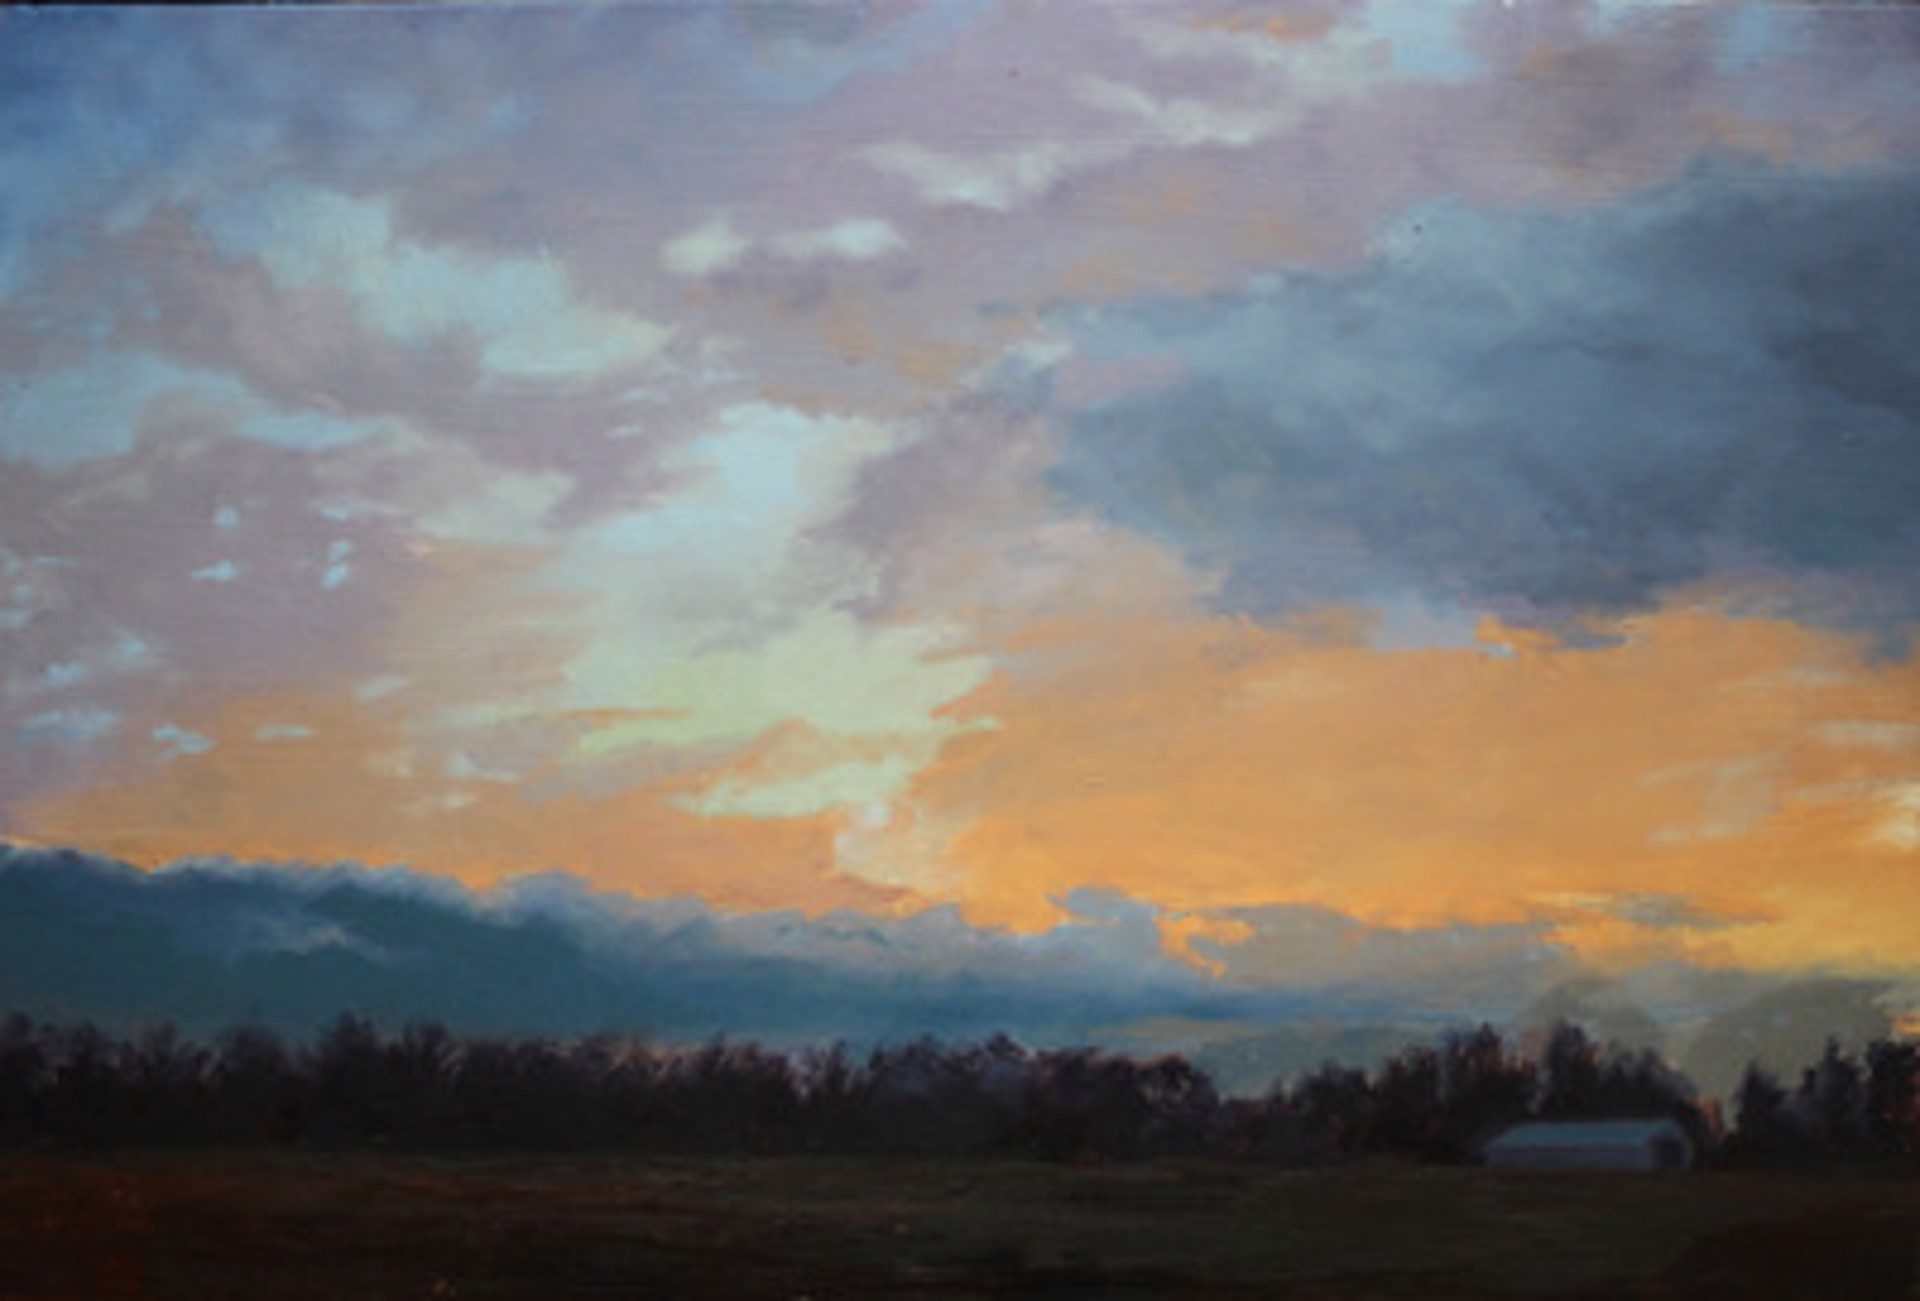 In the Gloaming by Dan Knepper